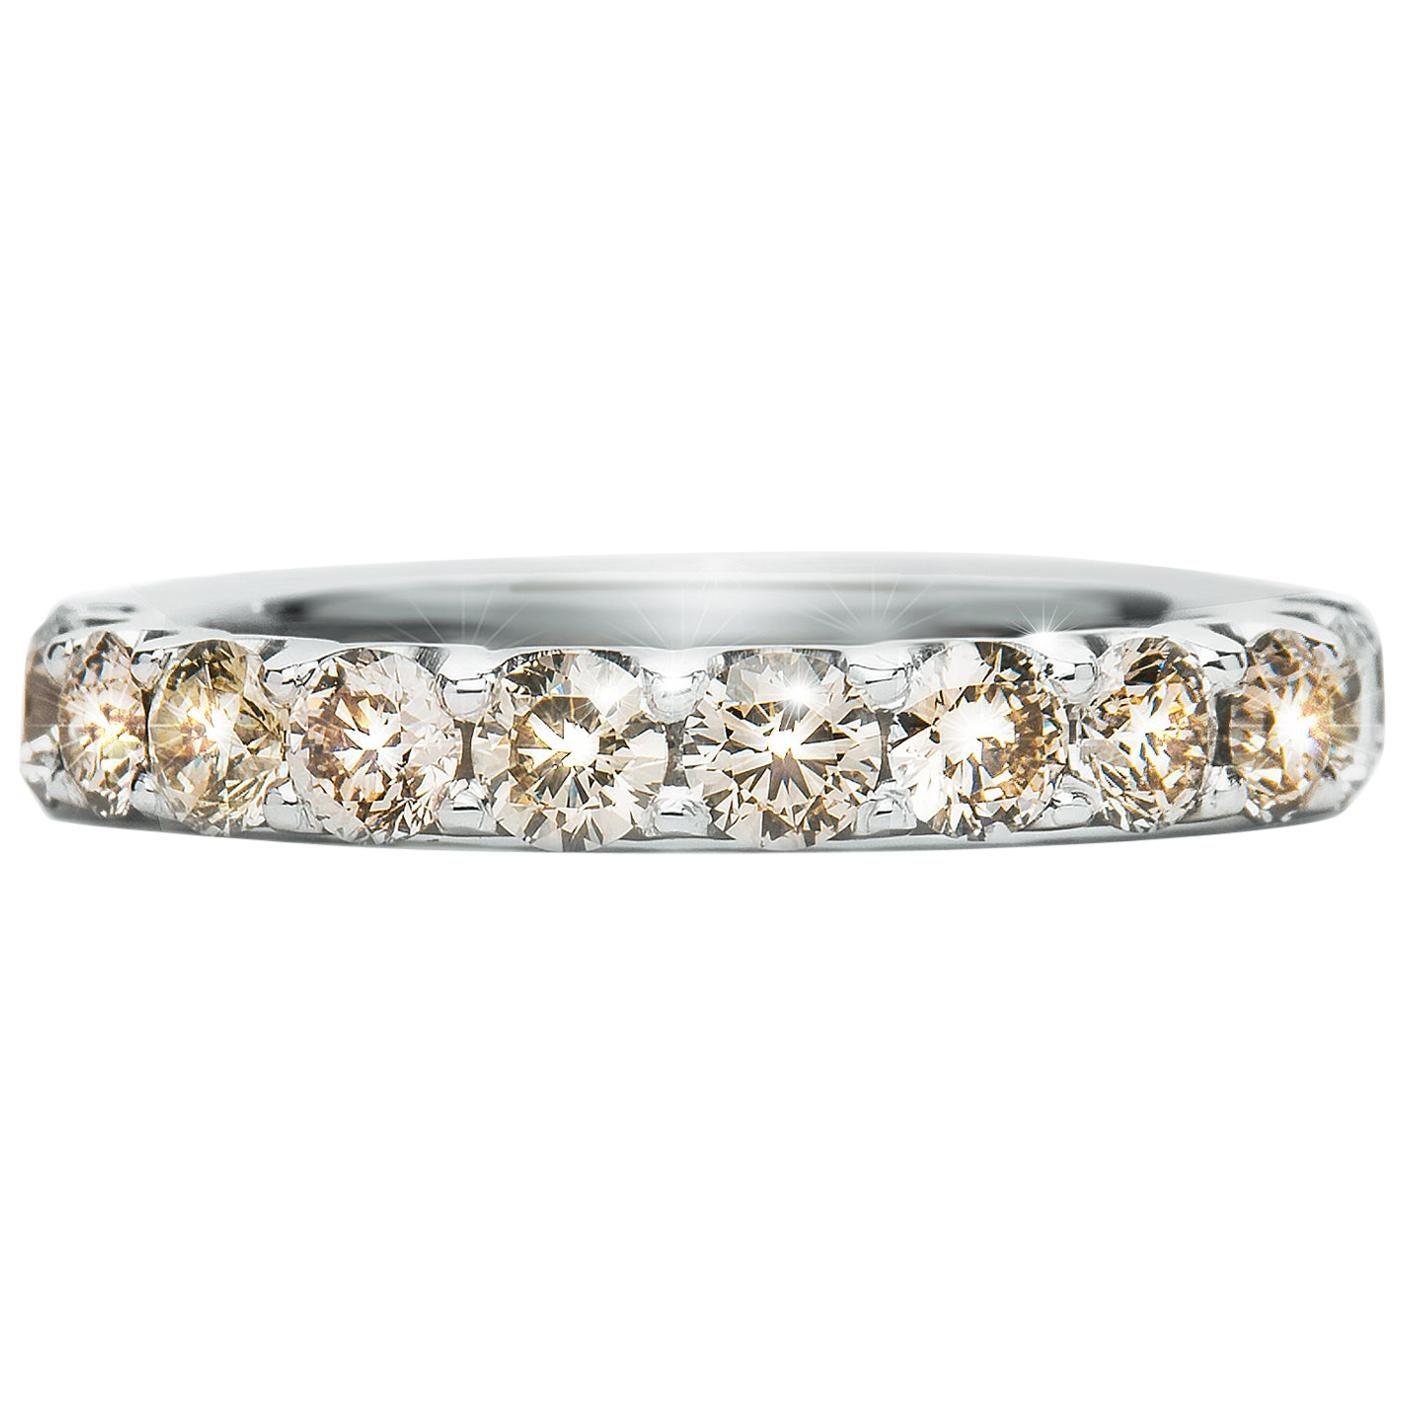 1.64 Carat Round Champagne Diamond Scalloped Claw Set Ring Natalie Barney